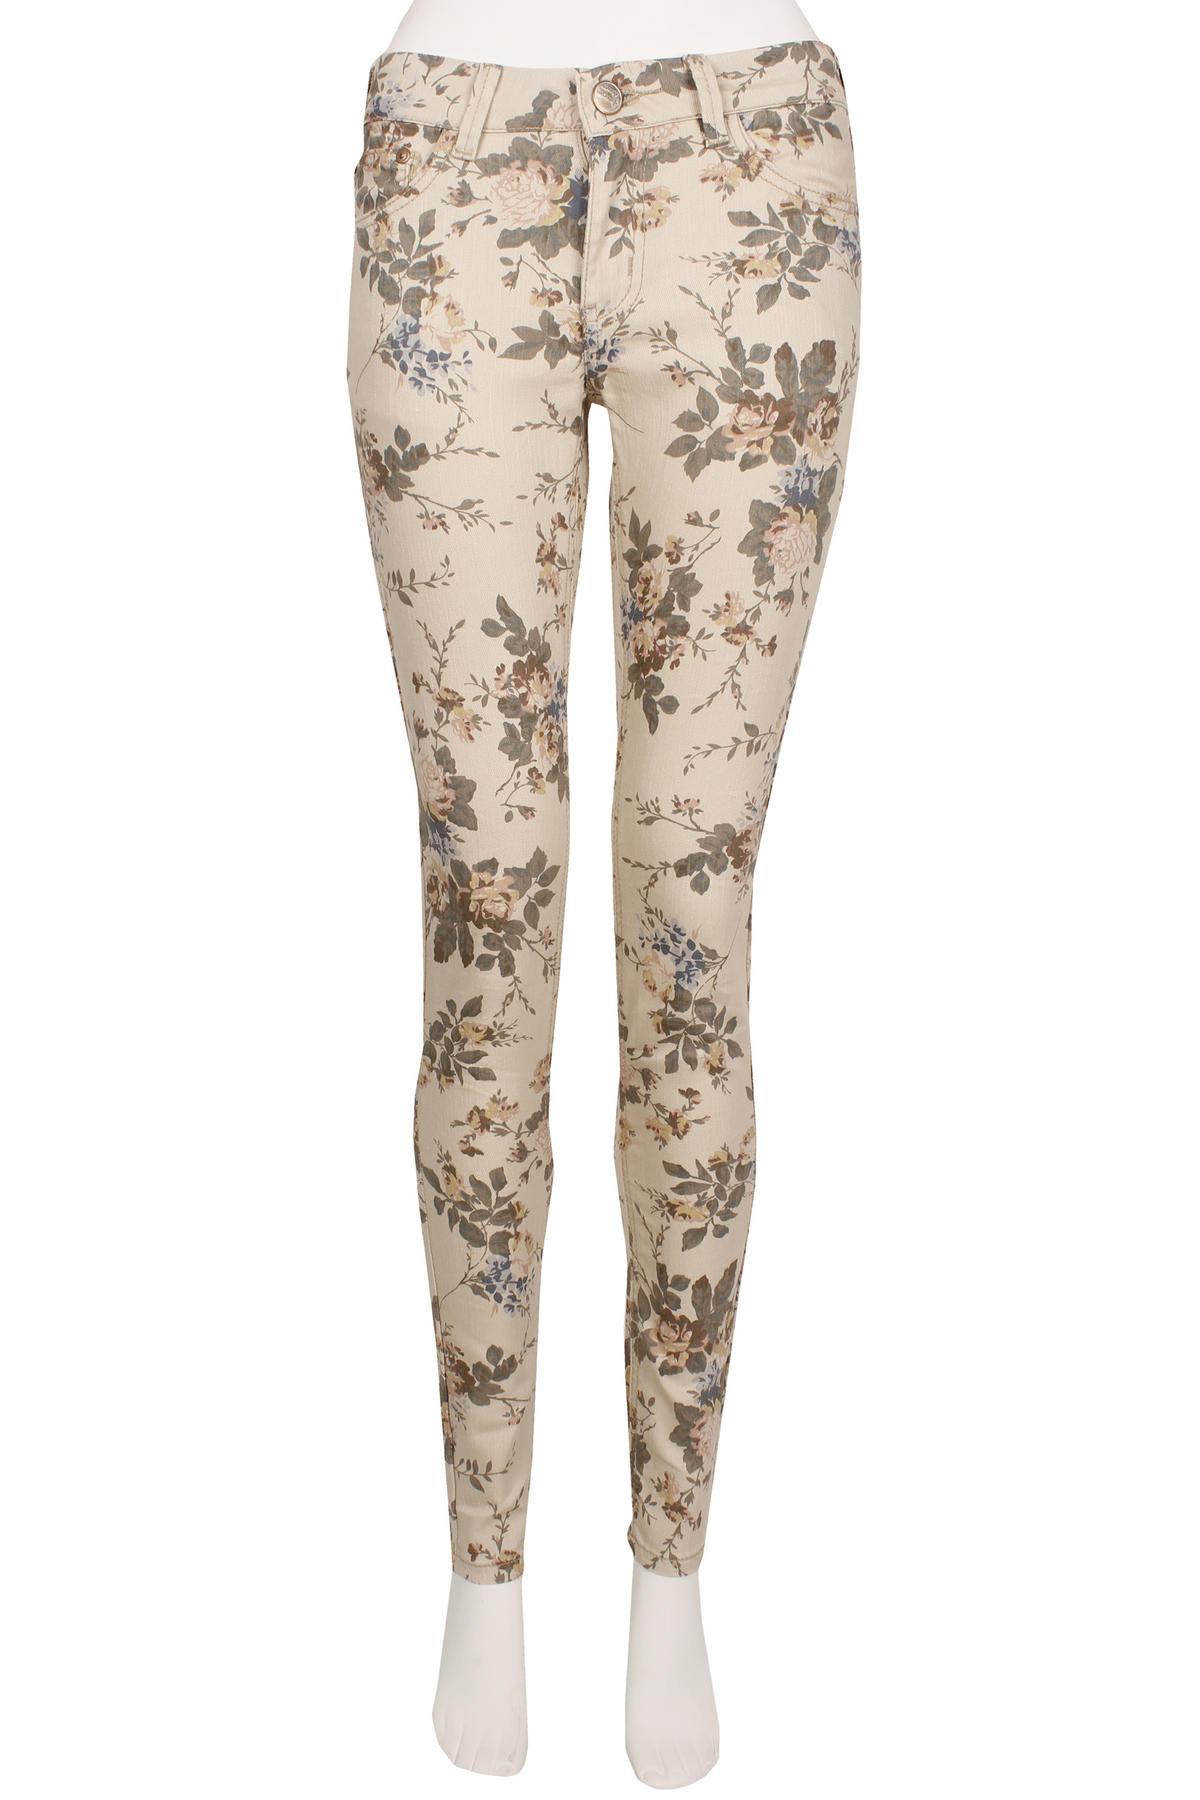 View Item Cream Floral Skinny Jeans